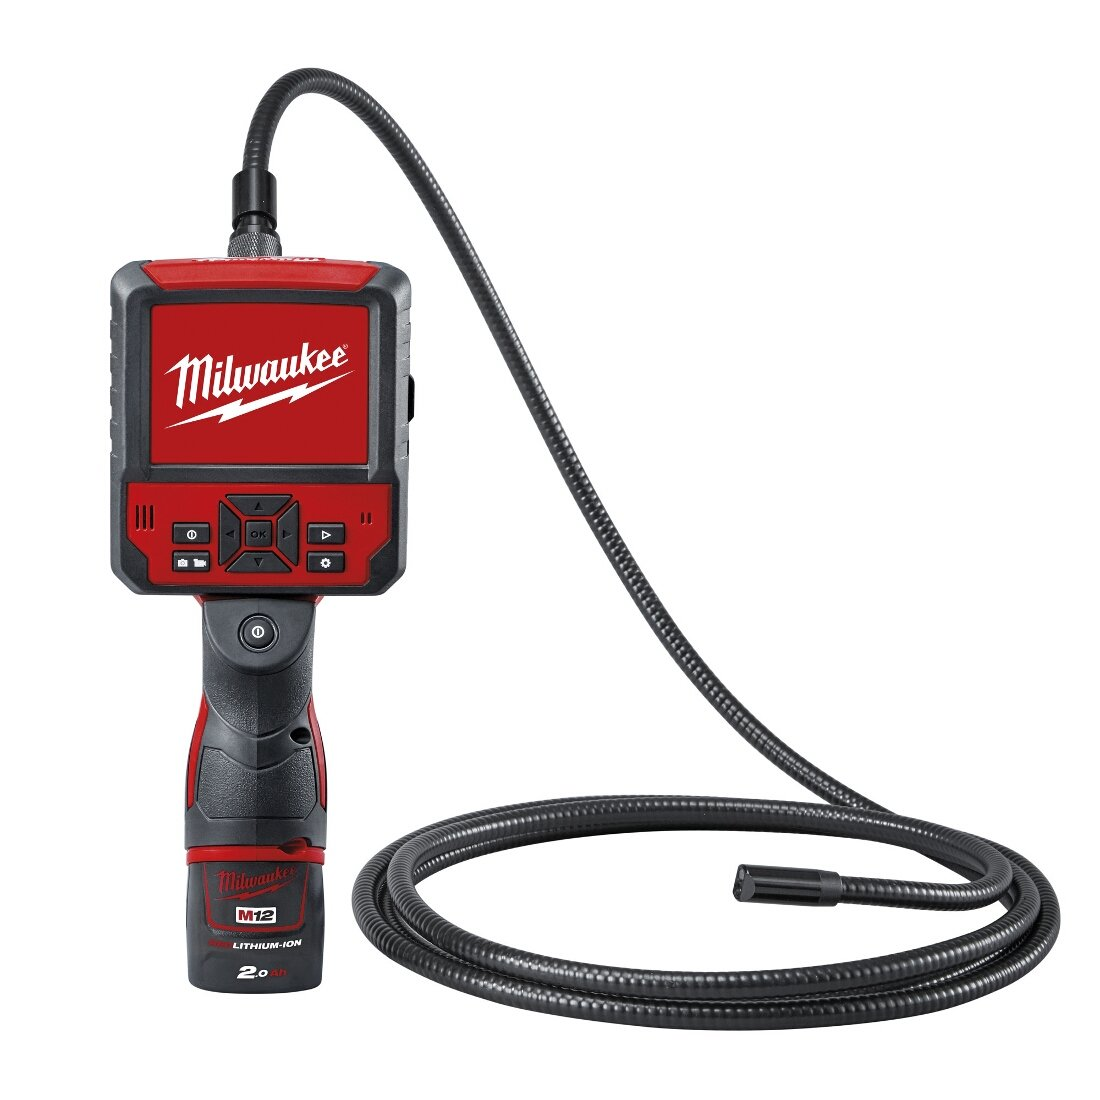 Milwaukee 4933451367–M12icav3–201C fotocamera ispezione digitale di 17mm, 640x 320, 12V 2,0ah con testa rotante 640x 320 12V 2 0ah con testa rotante